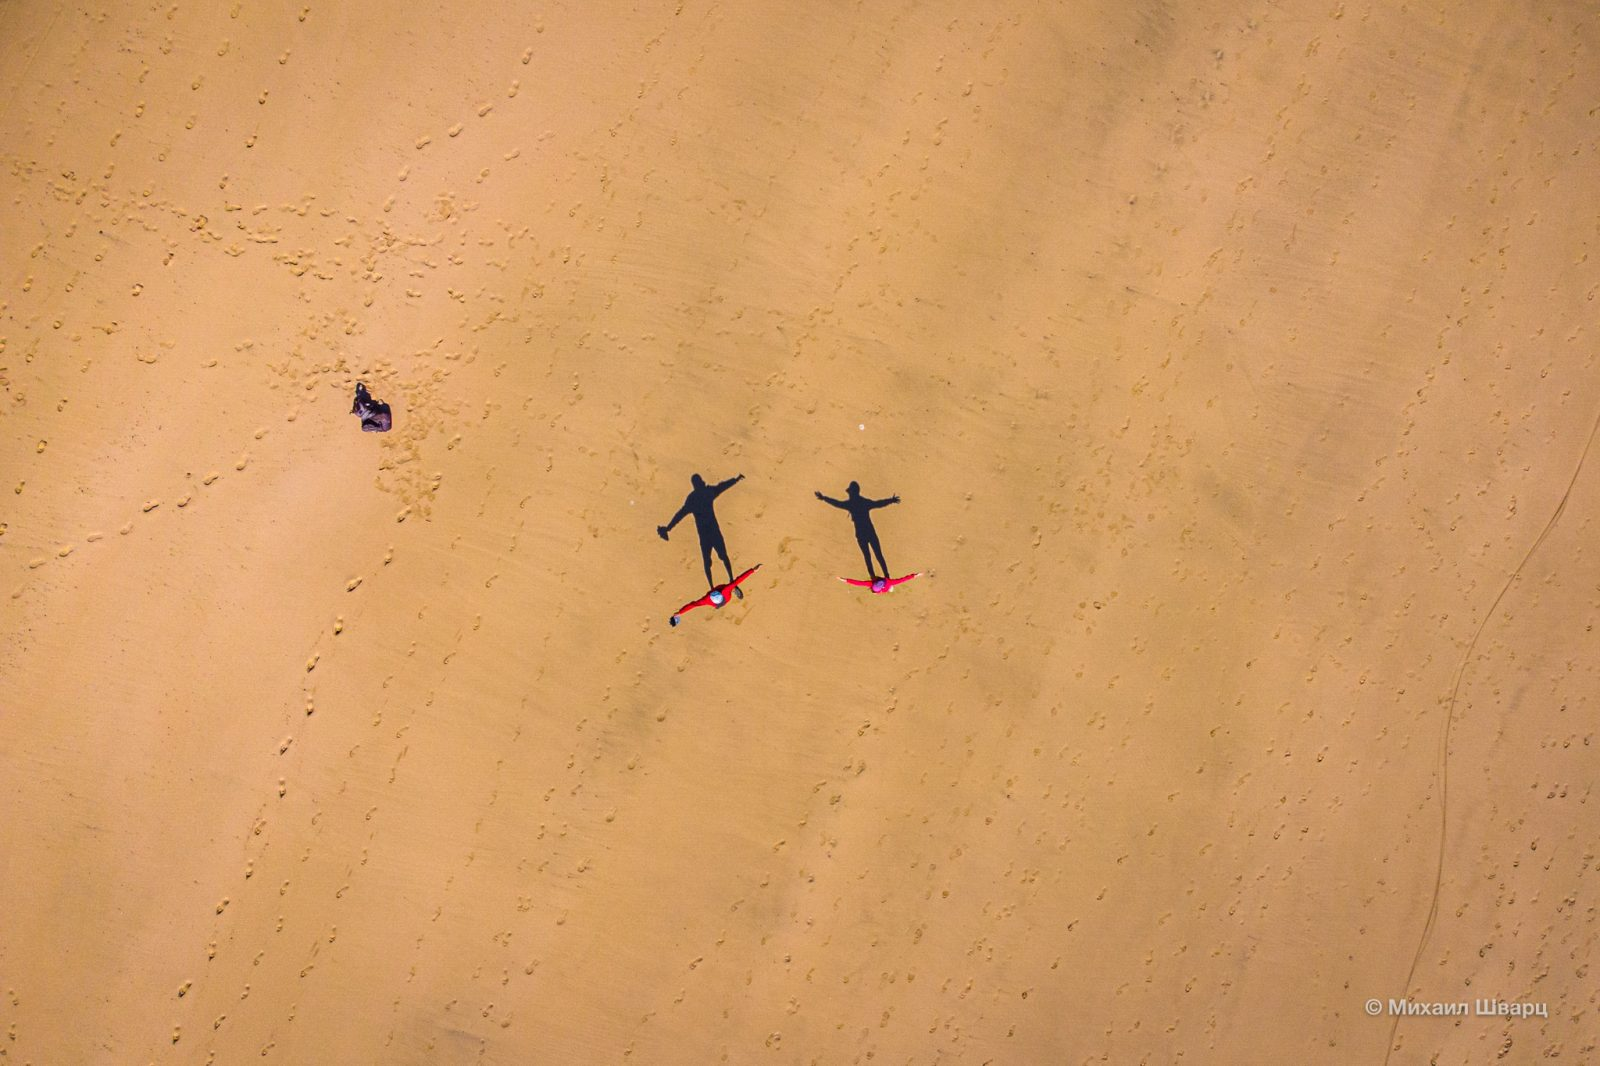 И только тени на песке